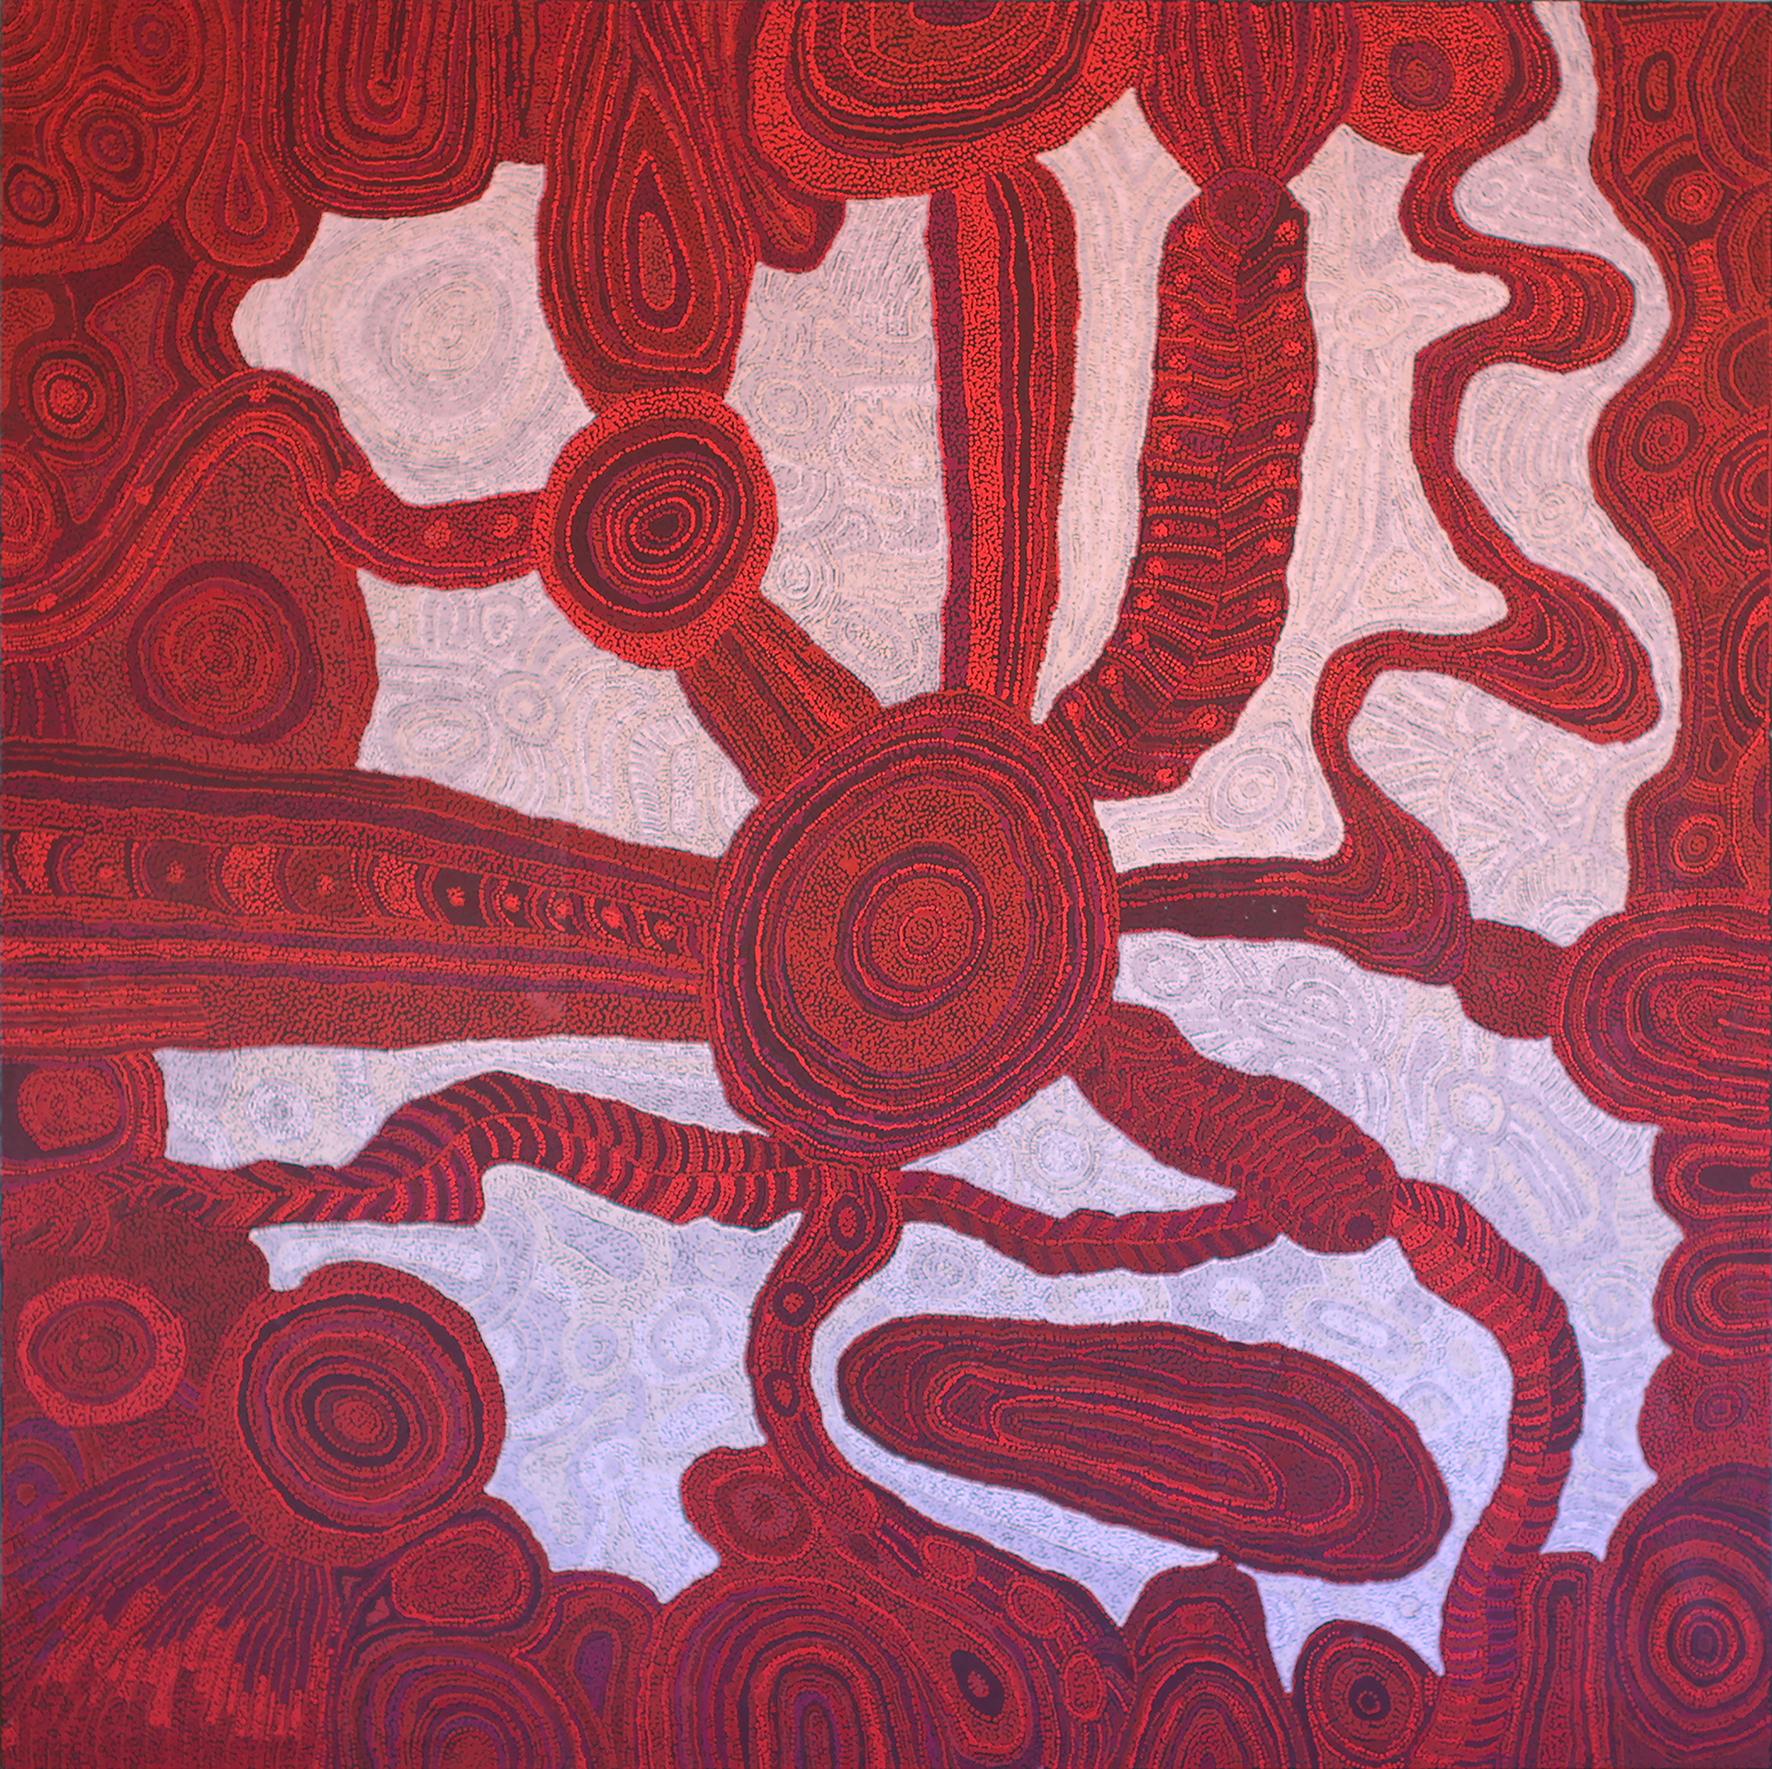 "Betty Kuntiwa Pumani  Antara (Maku Dreaming)  Acrylic on linen 78"" x 78"" (198 x 198 cm) Catalog #225-15  *Winner of the 2015 NATSIAA painting award * SOLD"